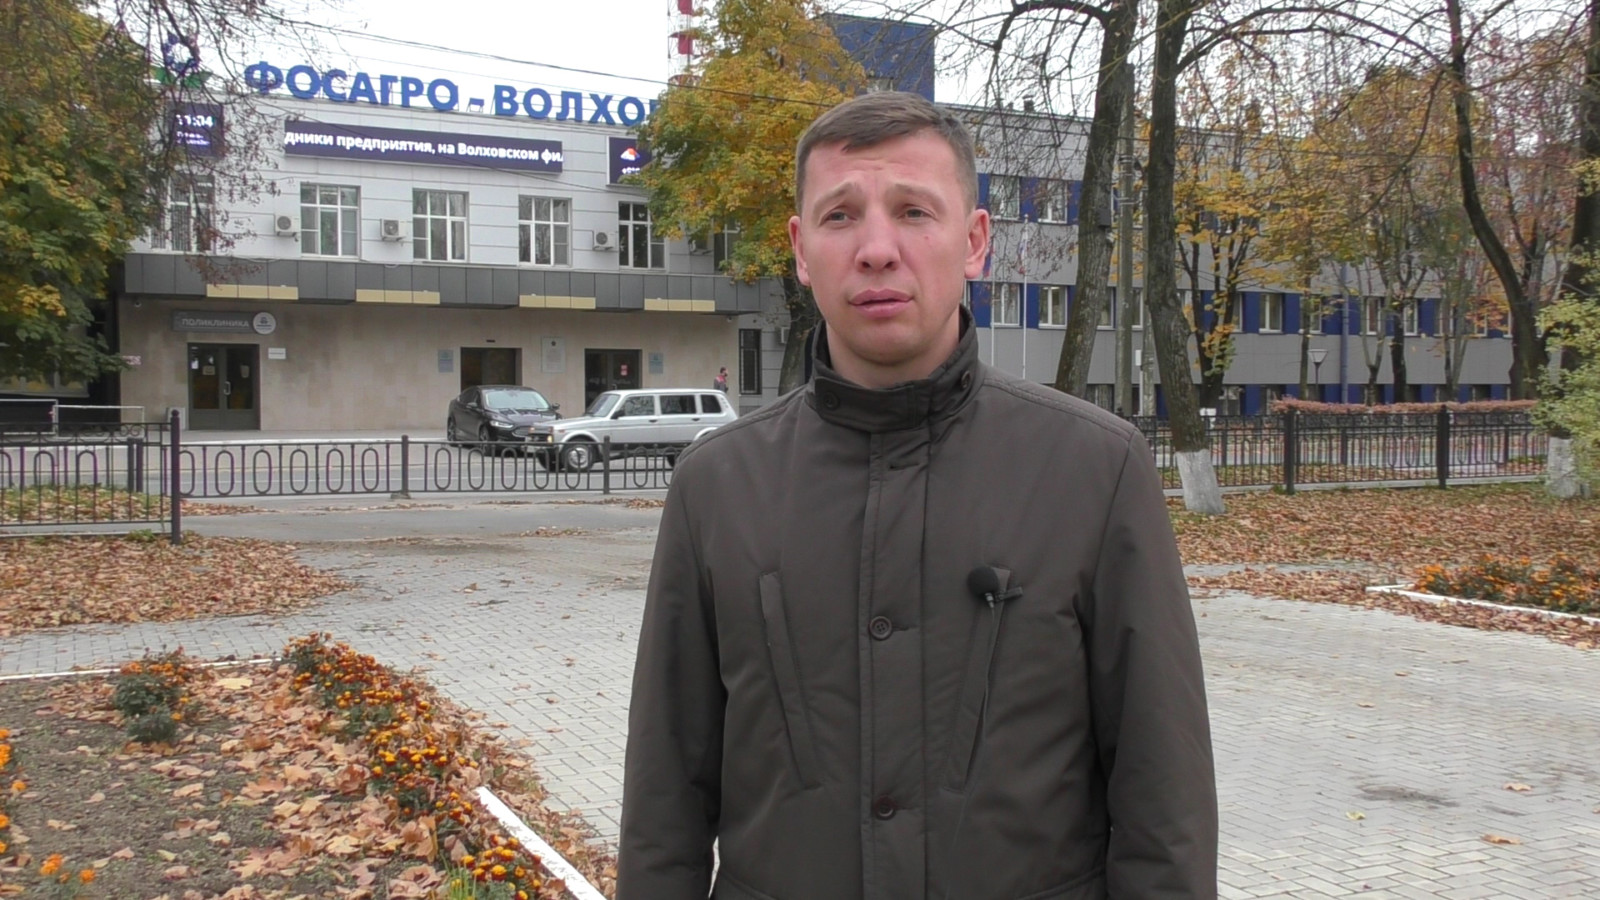 Глава Волховского района поздравил ФосАгро с 20-летним юбилеем